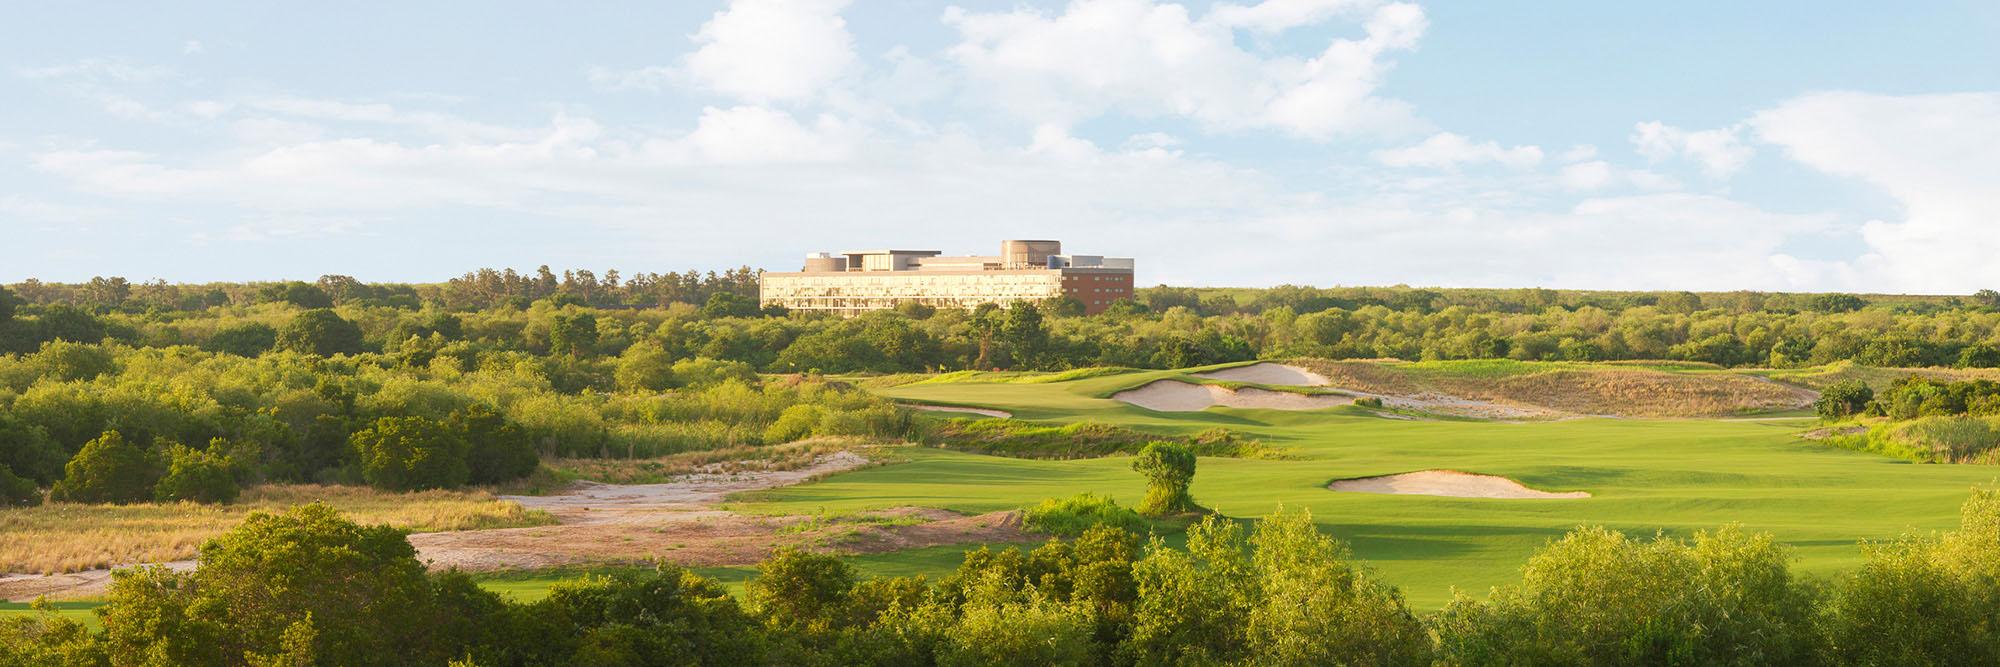 Golf Course Image - Streamsong Blue No. 8